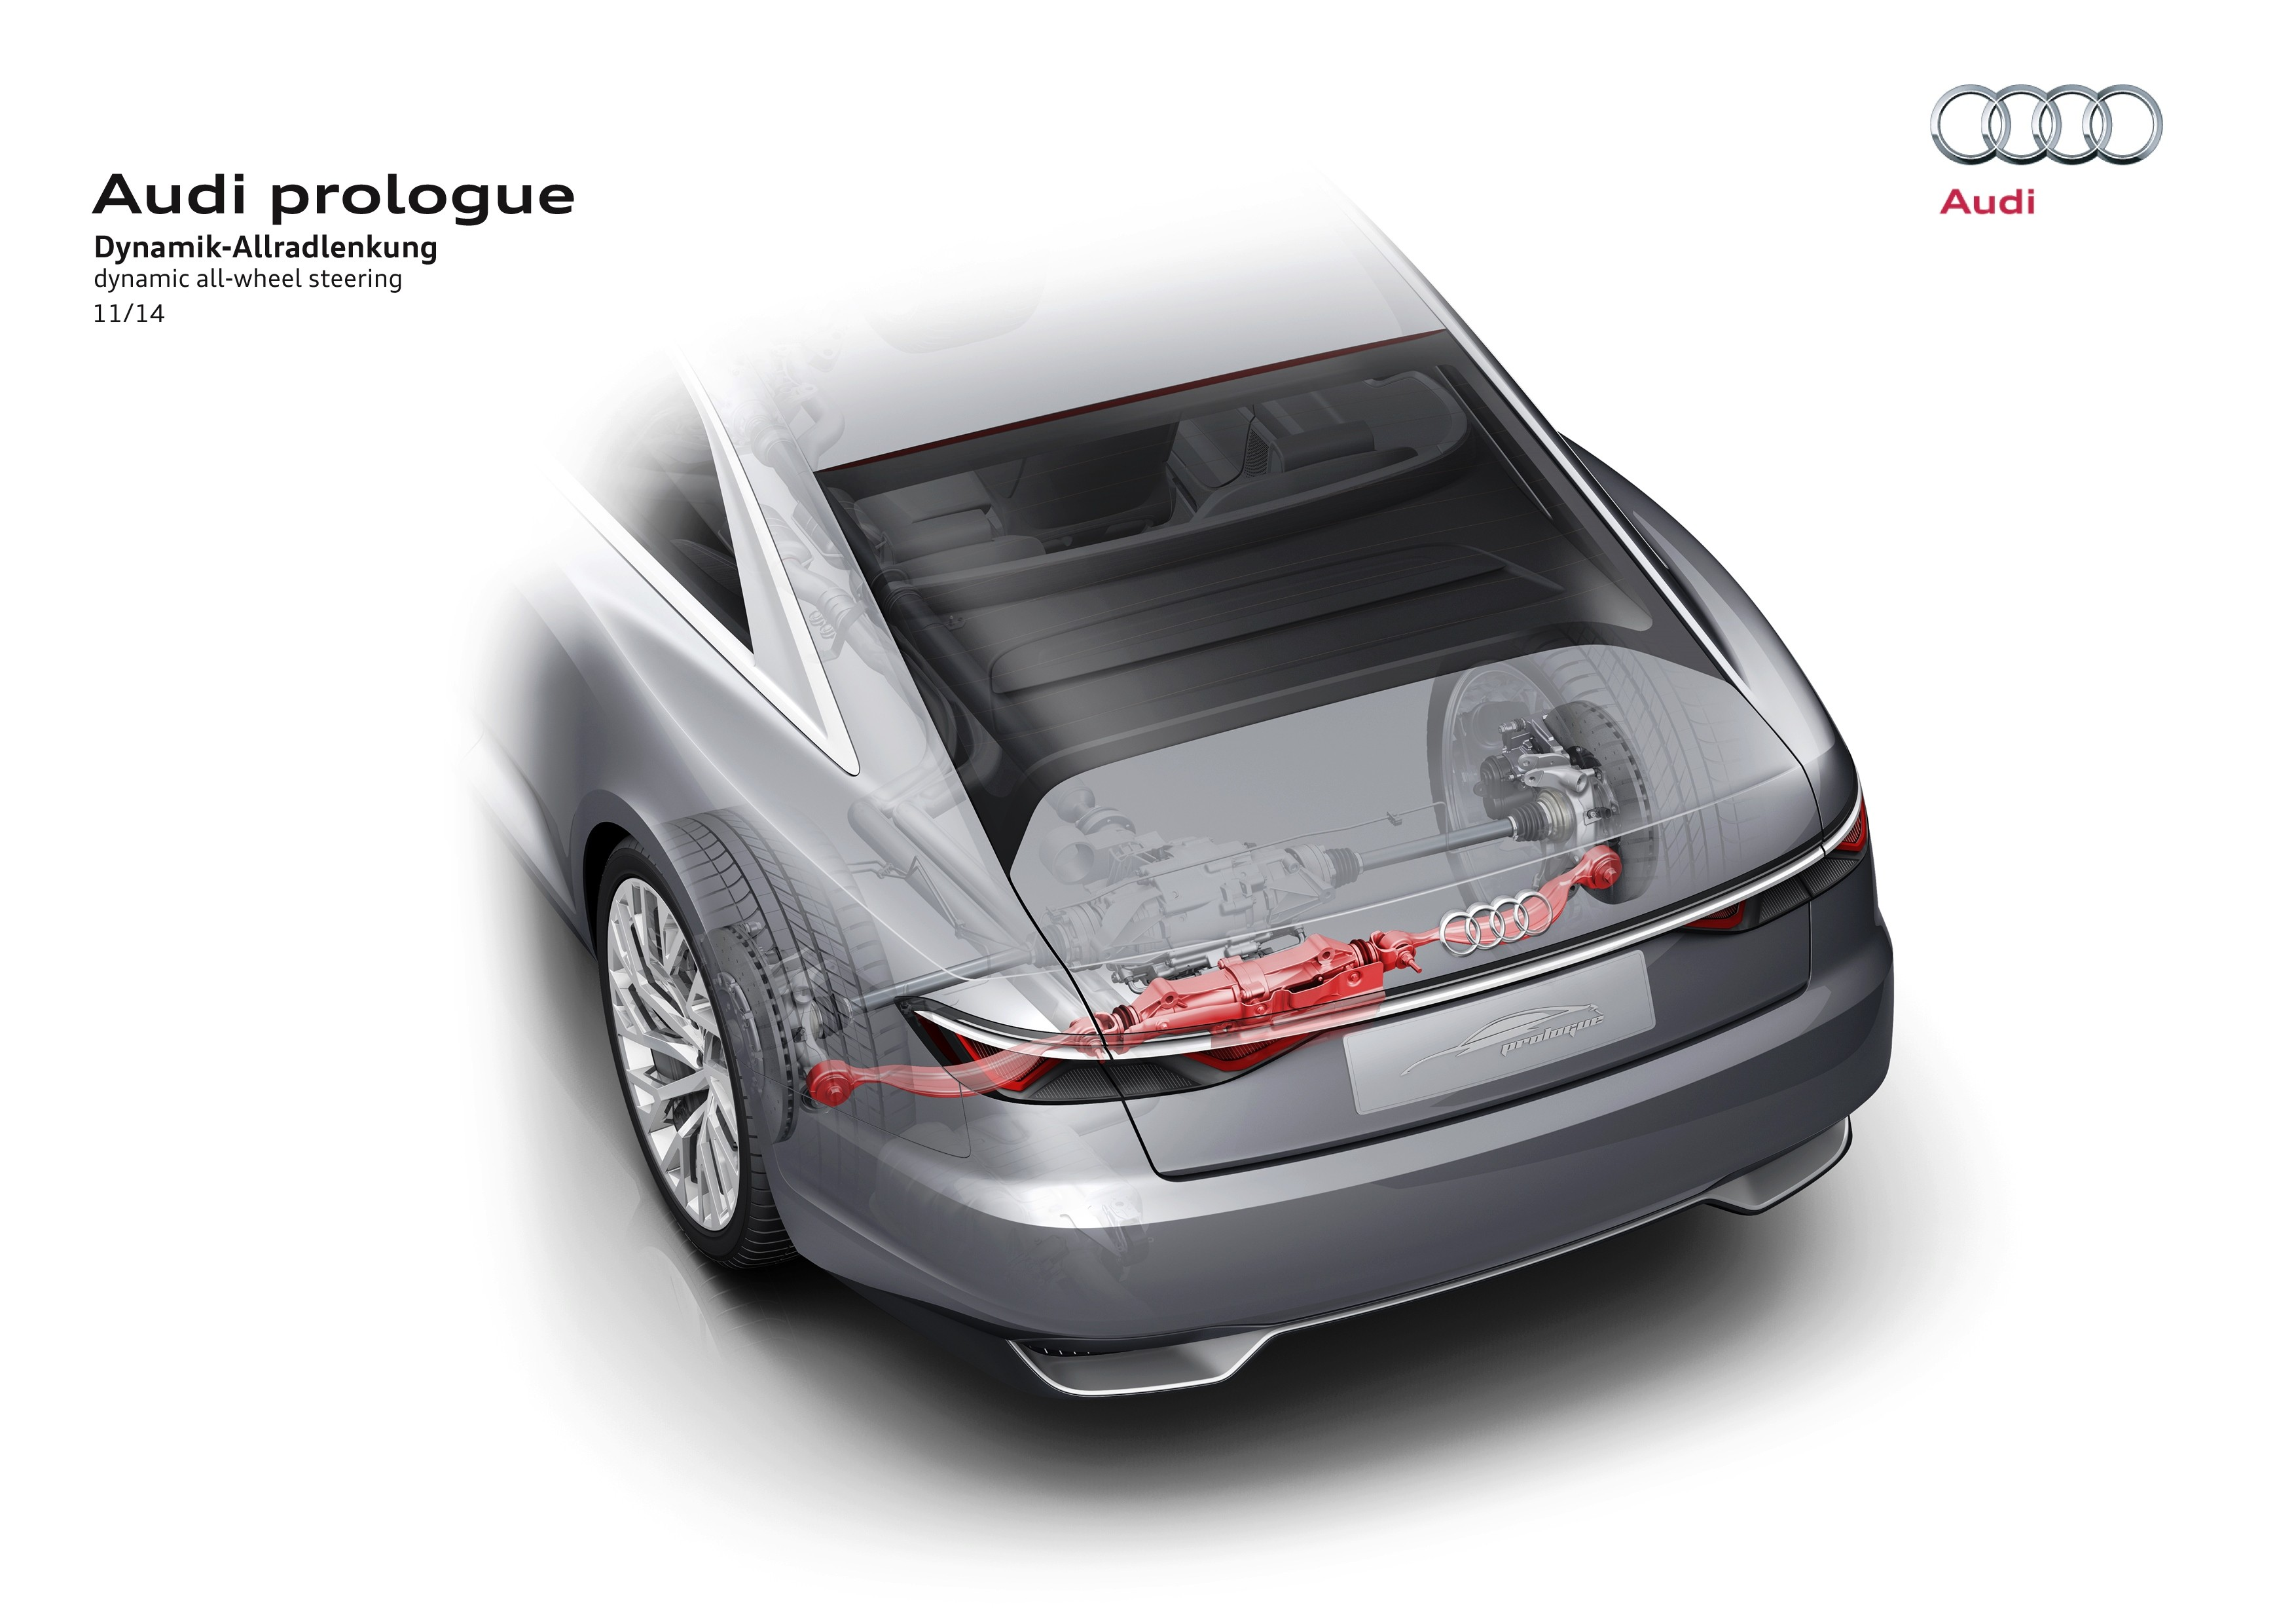 2014 Audi Prologue is Worst of LA 2014 12